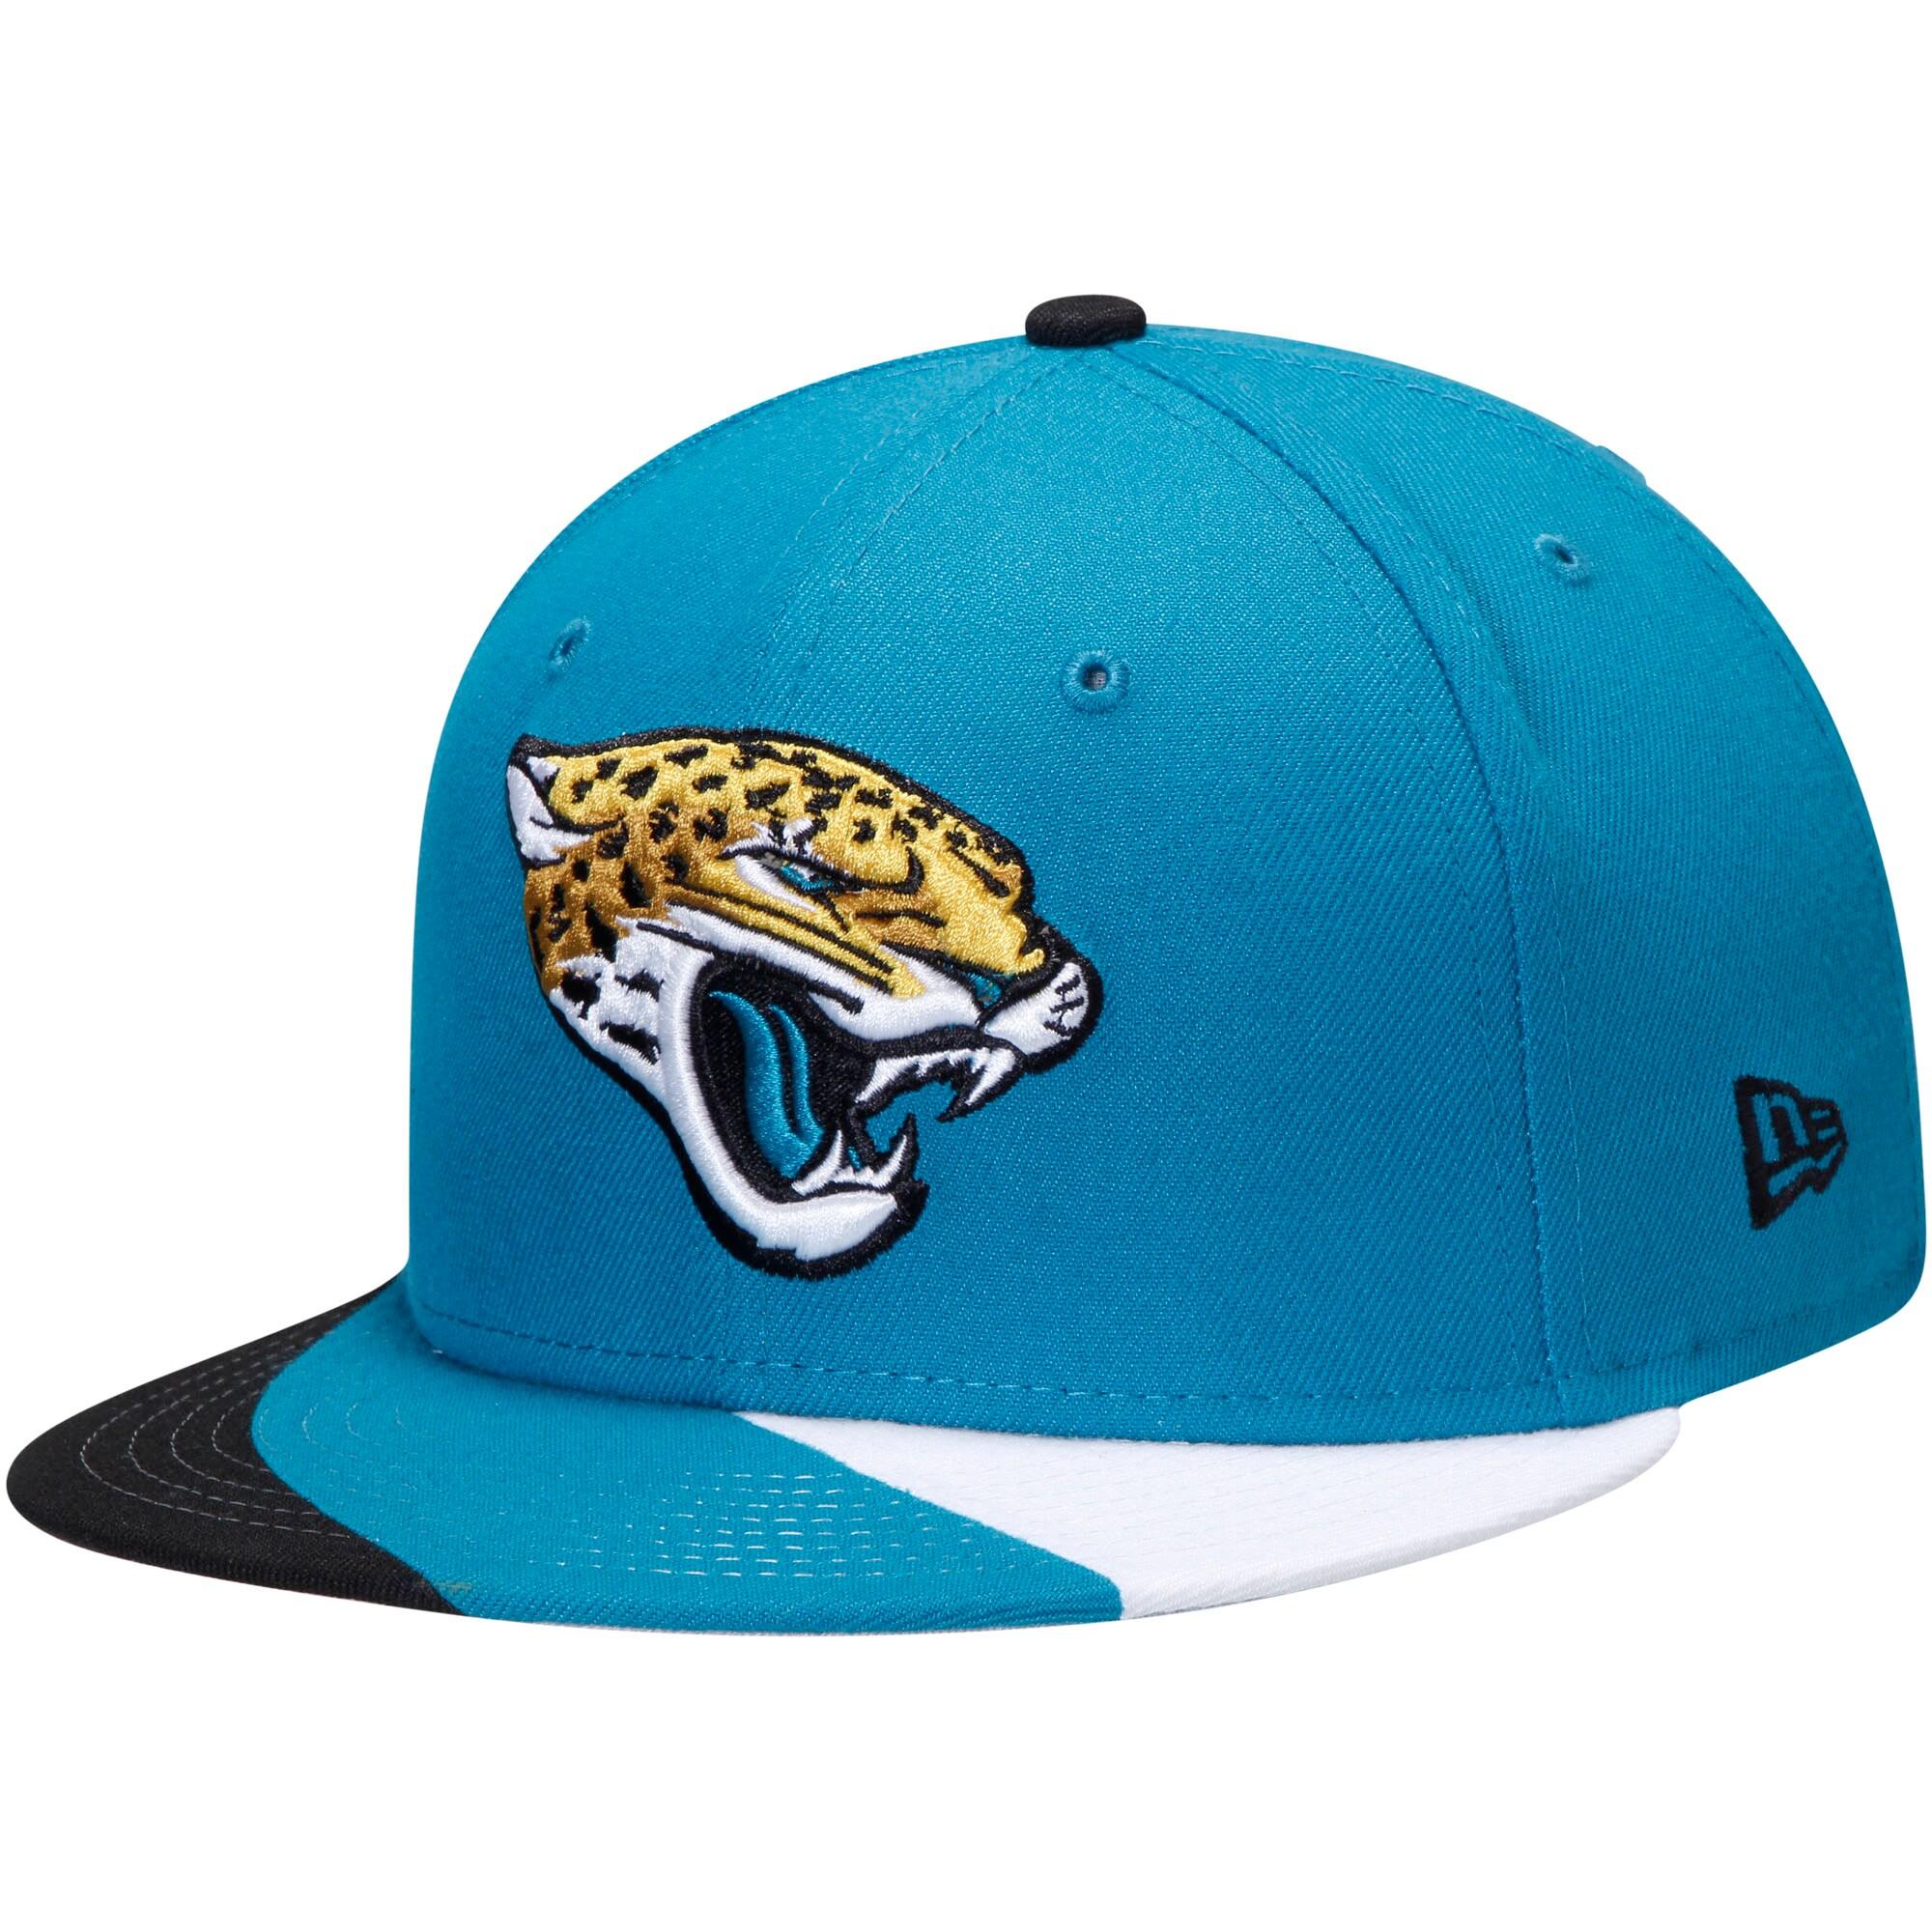 Jacksonville Jaguars New Era Curve 9FIFTY Adjustable Snapback Hat - Teal